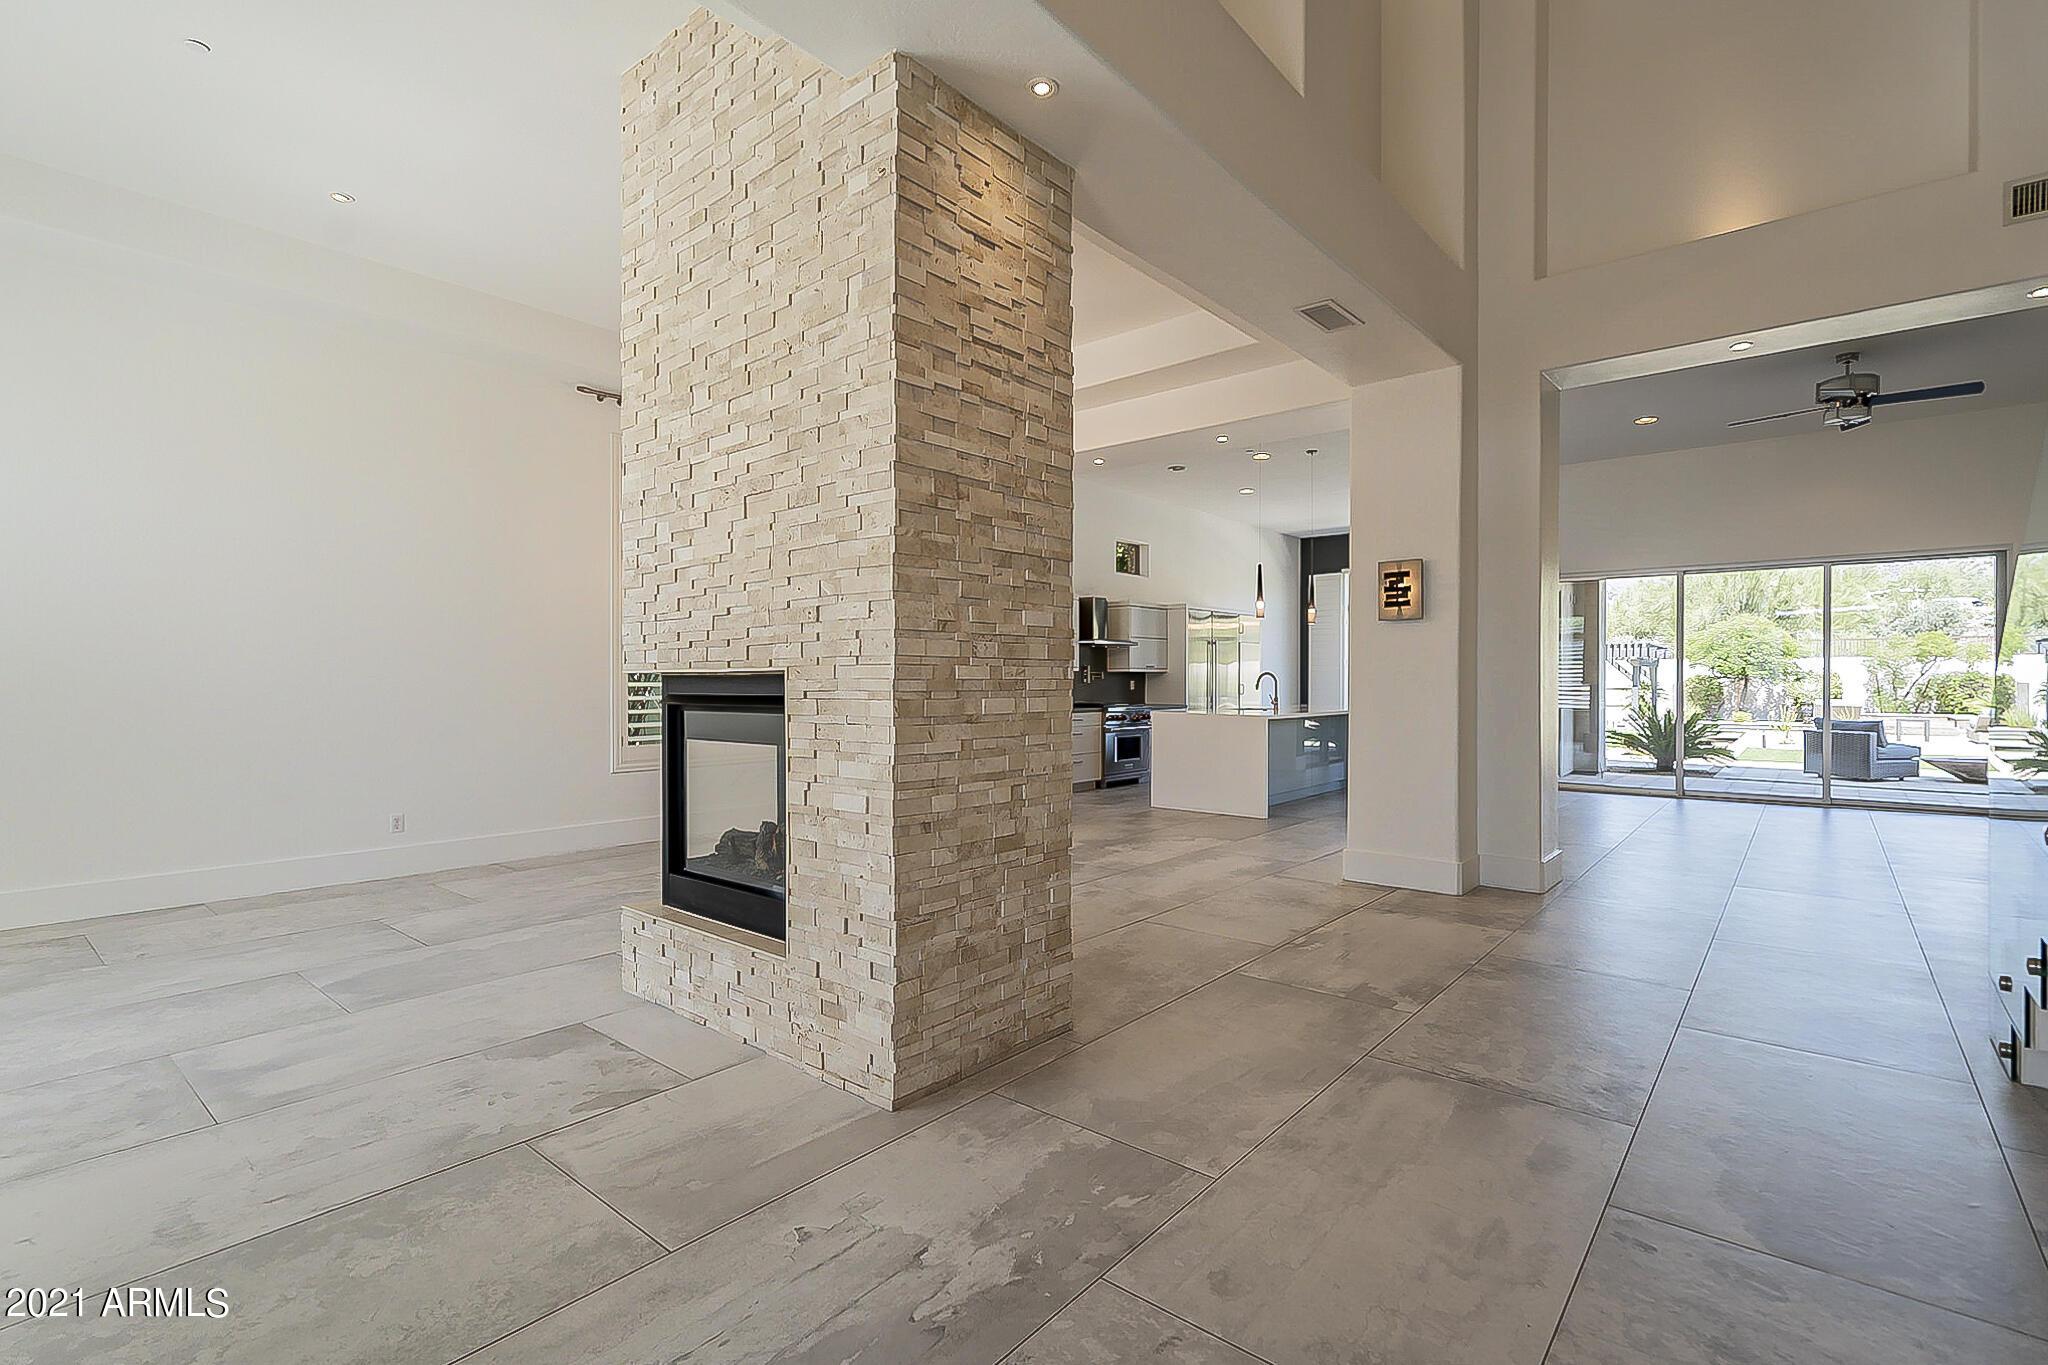 101ST Way, Scottsdale, Arizona 85255, 5 Bedrooms Bedrooms, ,4 BathroomsBathrooms,Residential,For Sale,101ST,6279850